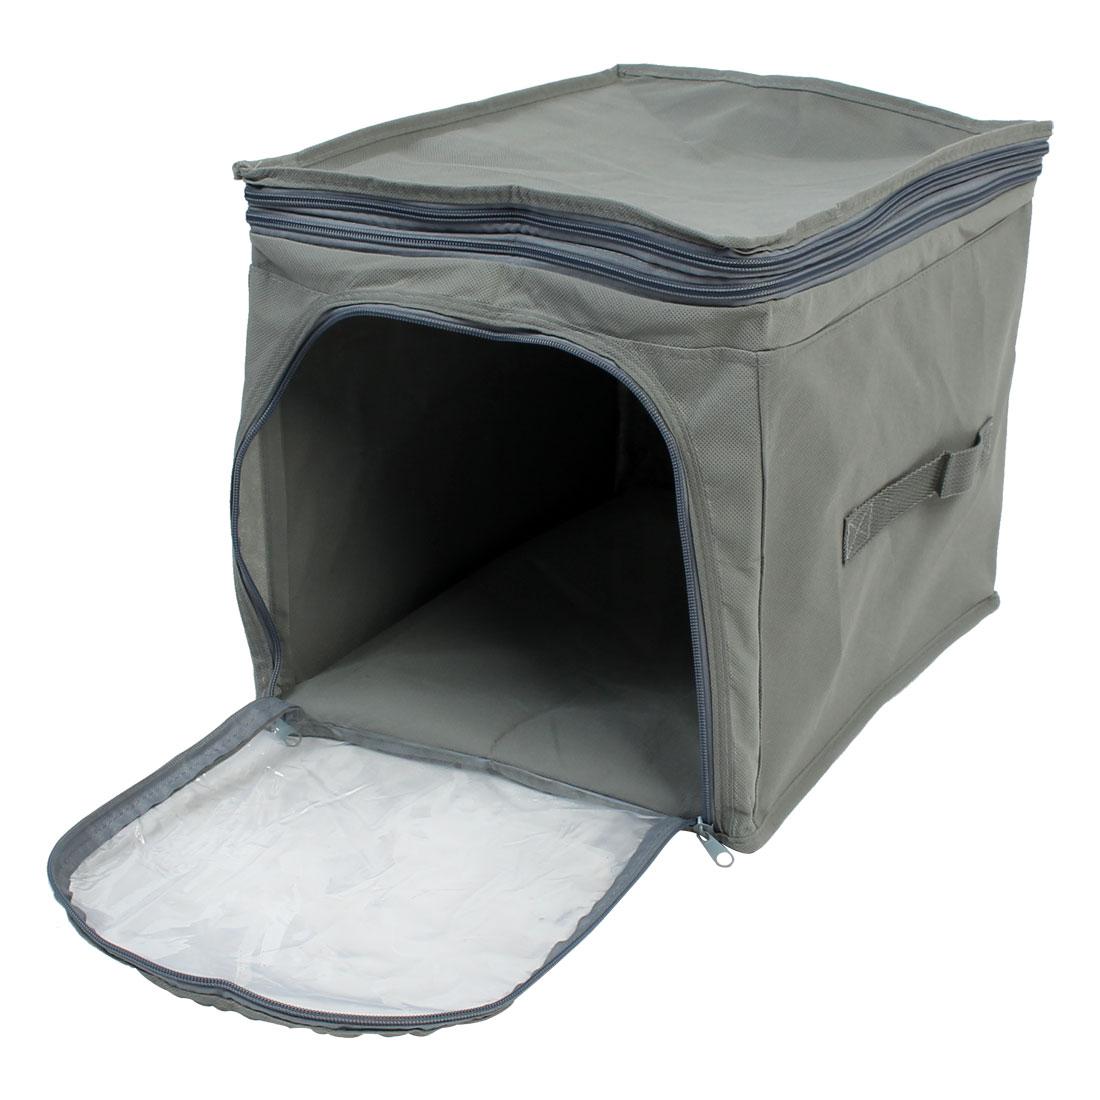 Home Wardrobe Adjustable Foldable Visual Clothing Storage Box Finishing Bag Gray